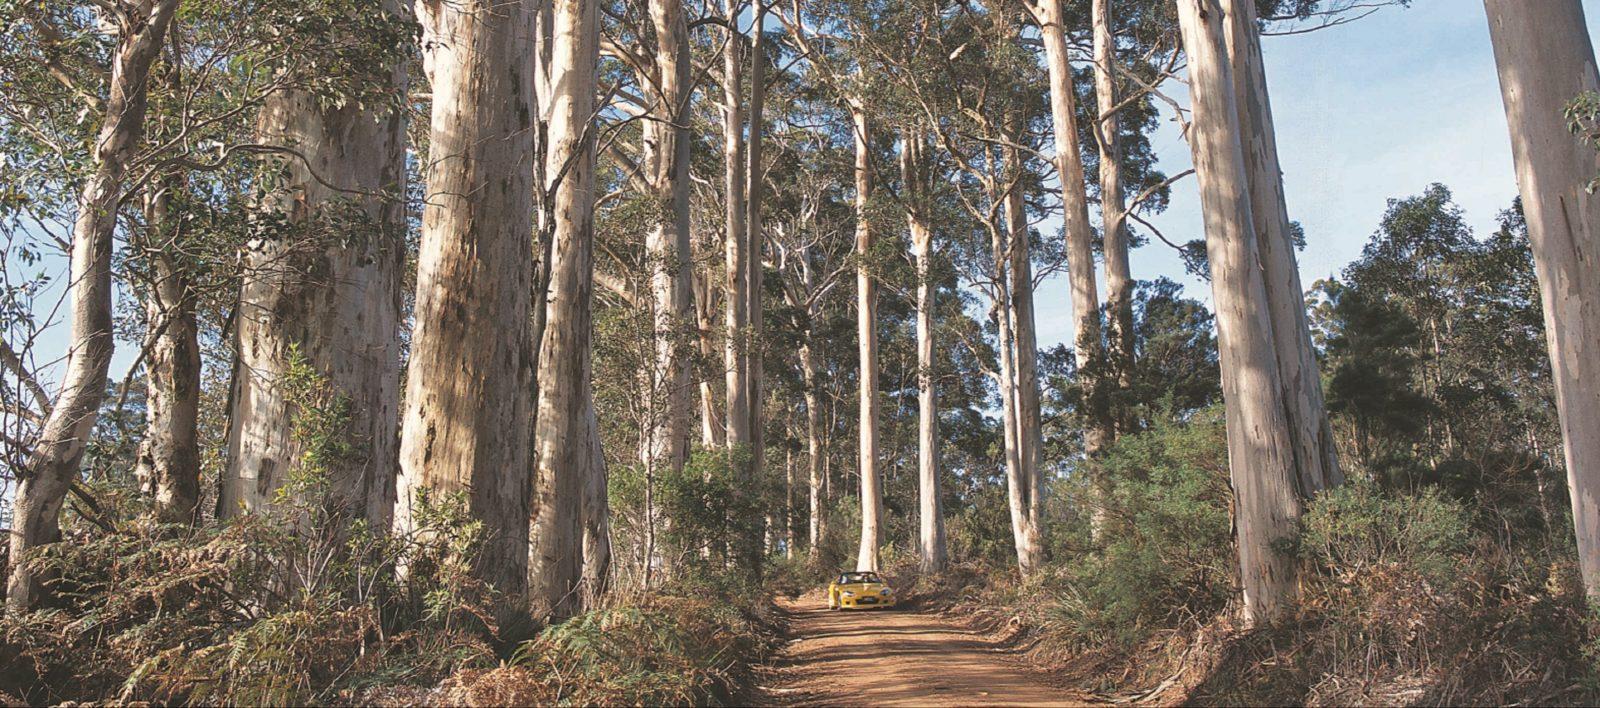 Mount Shadforth Scenic Drive, Denmark, Western Australia